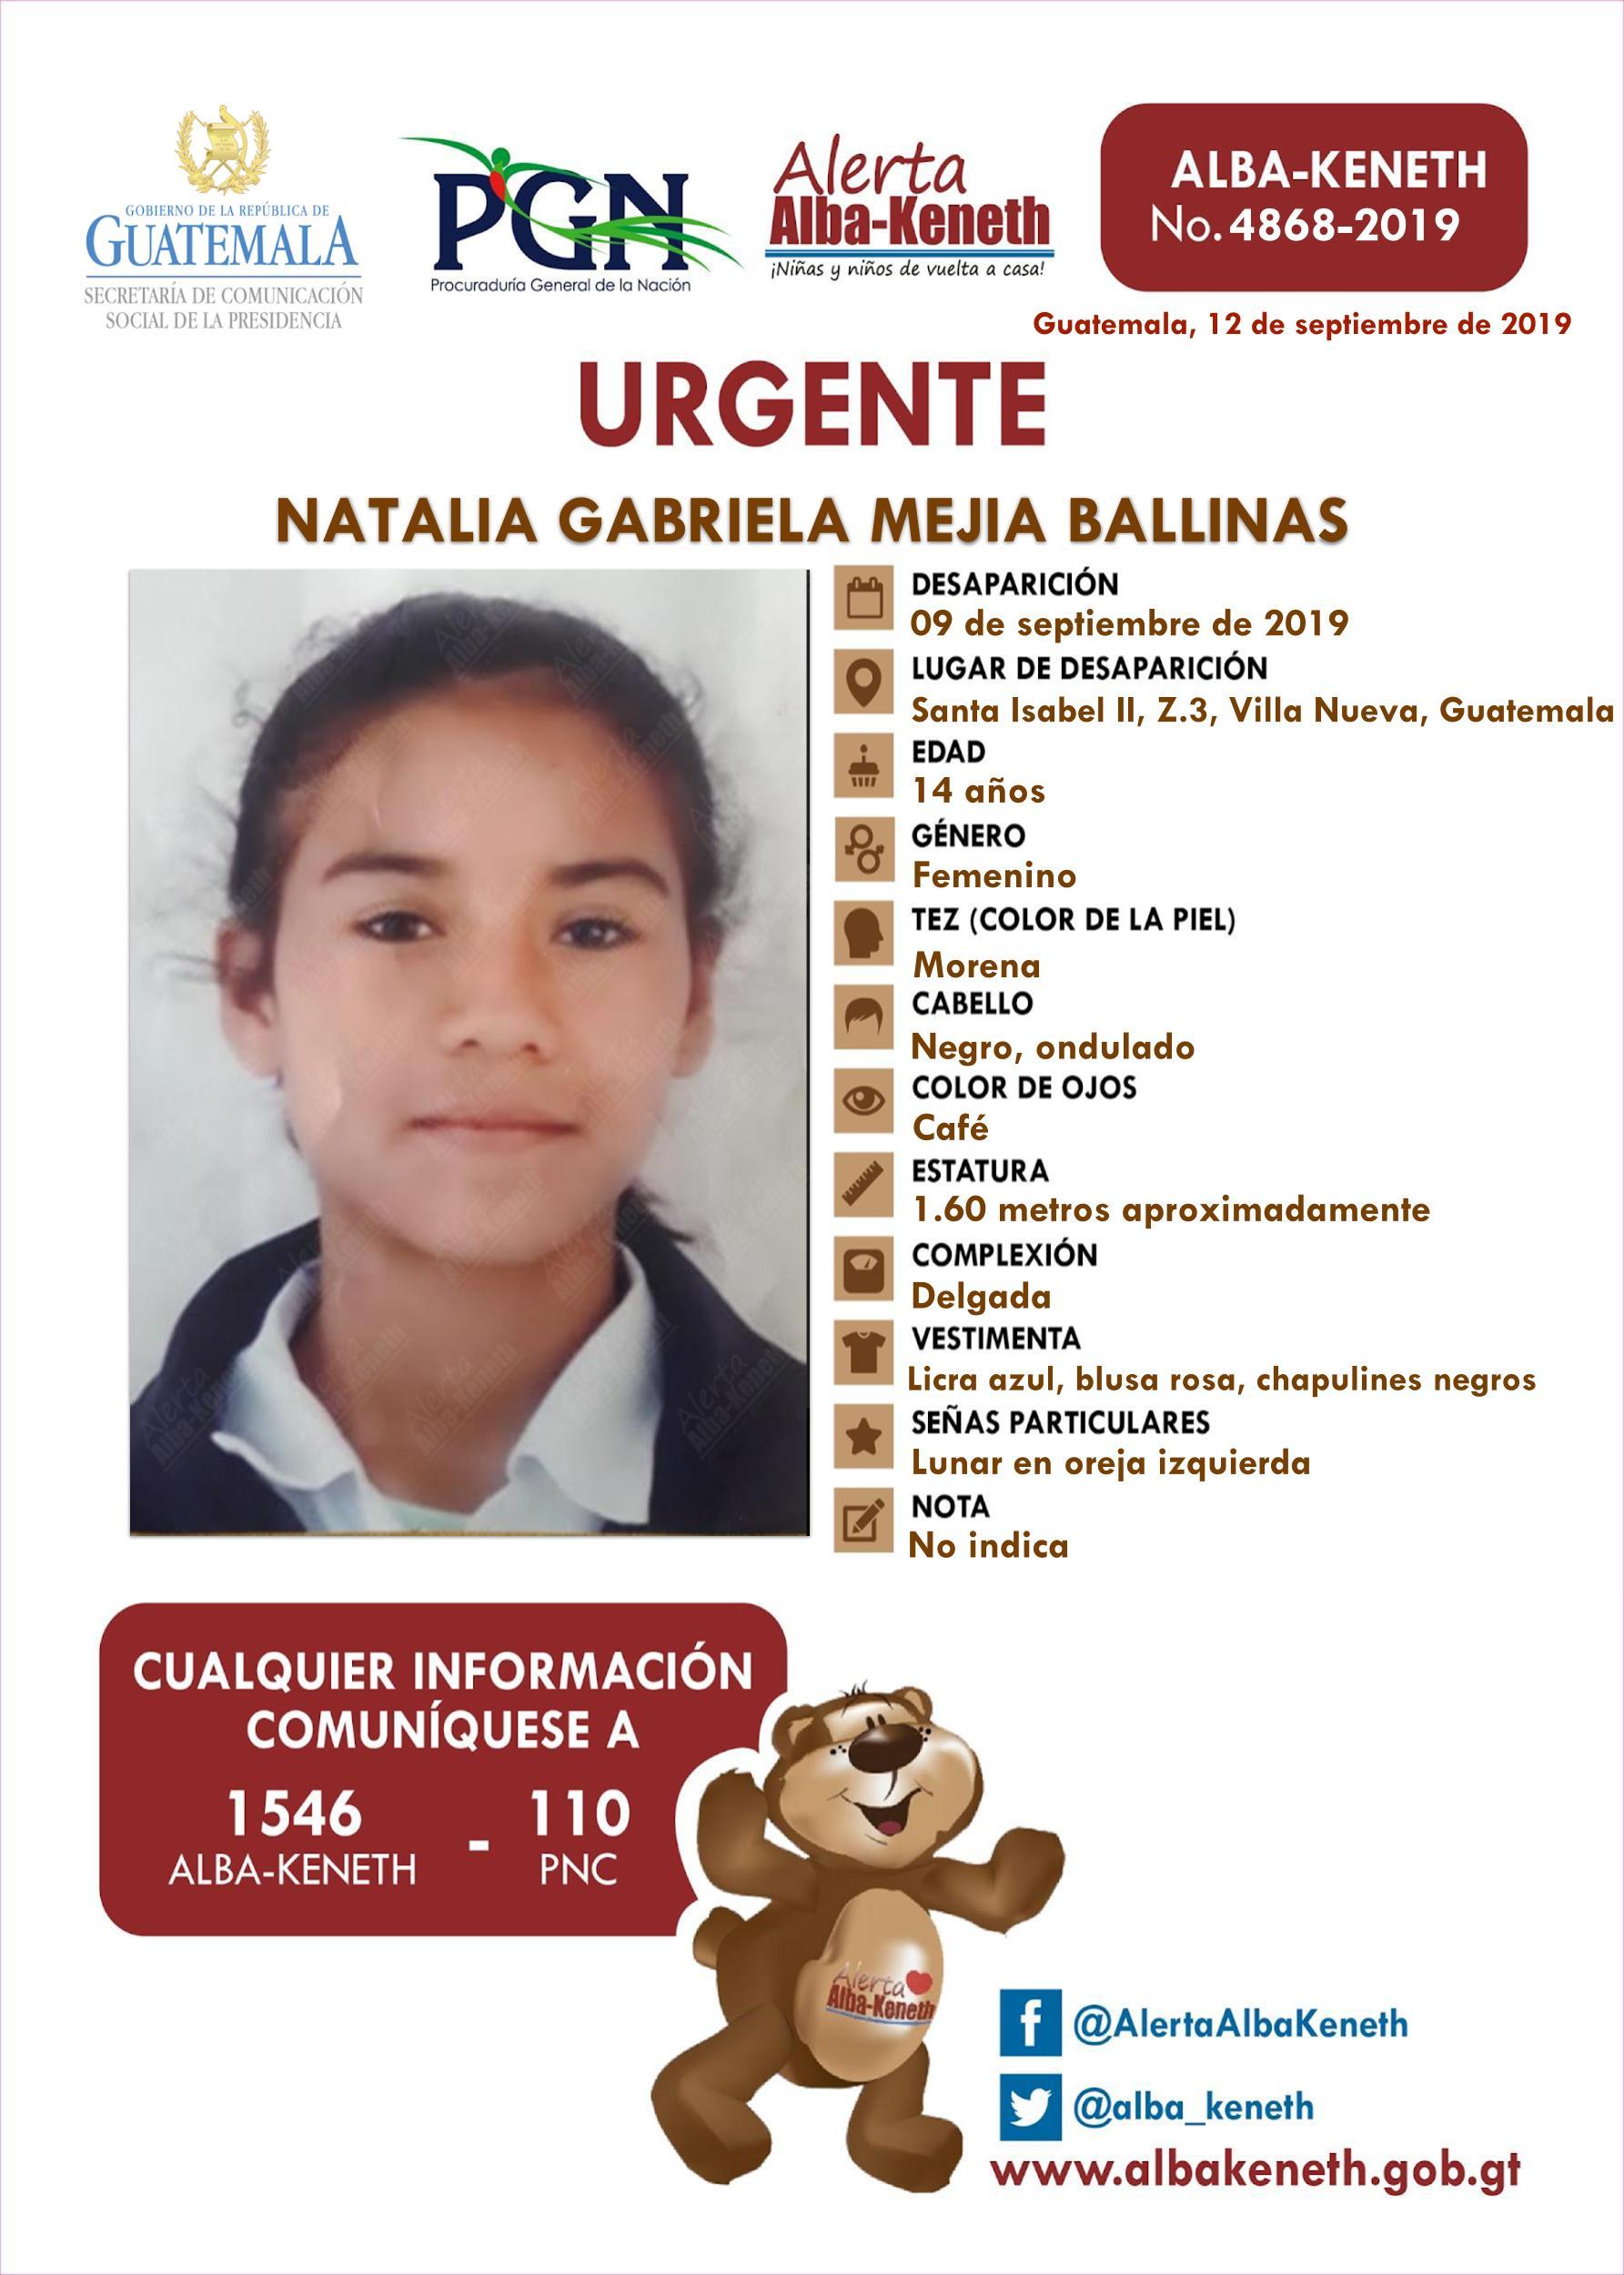 Natalia Gabriela Mejia Ballinas